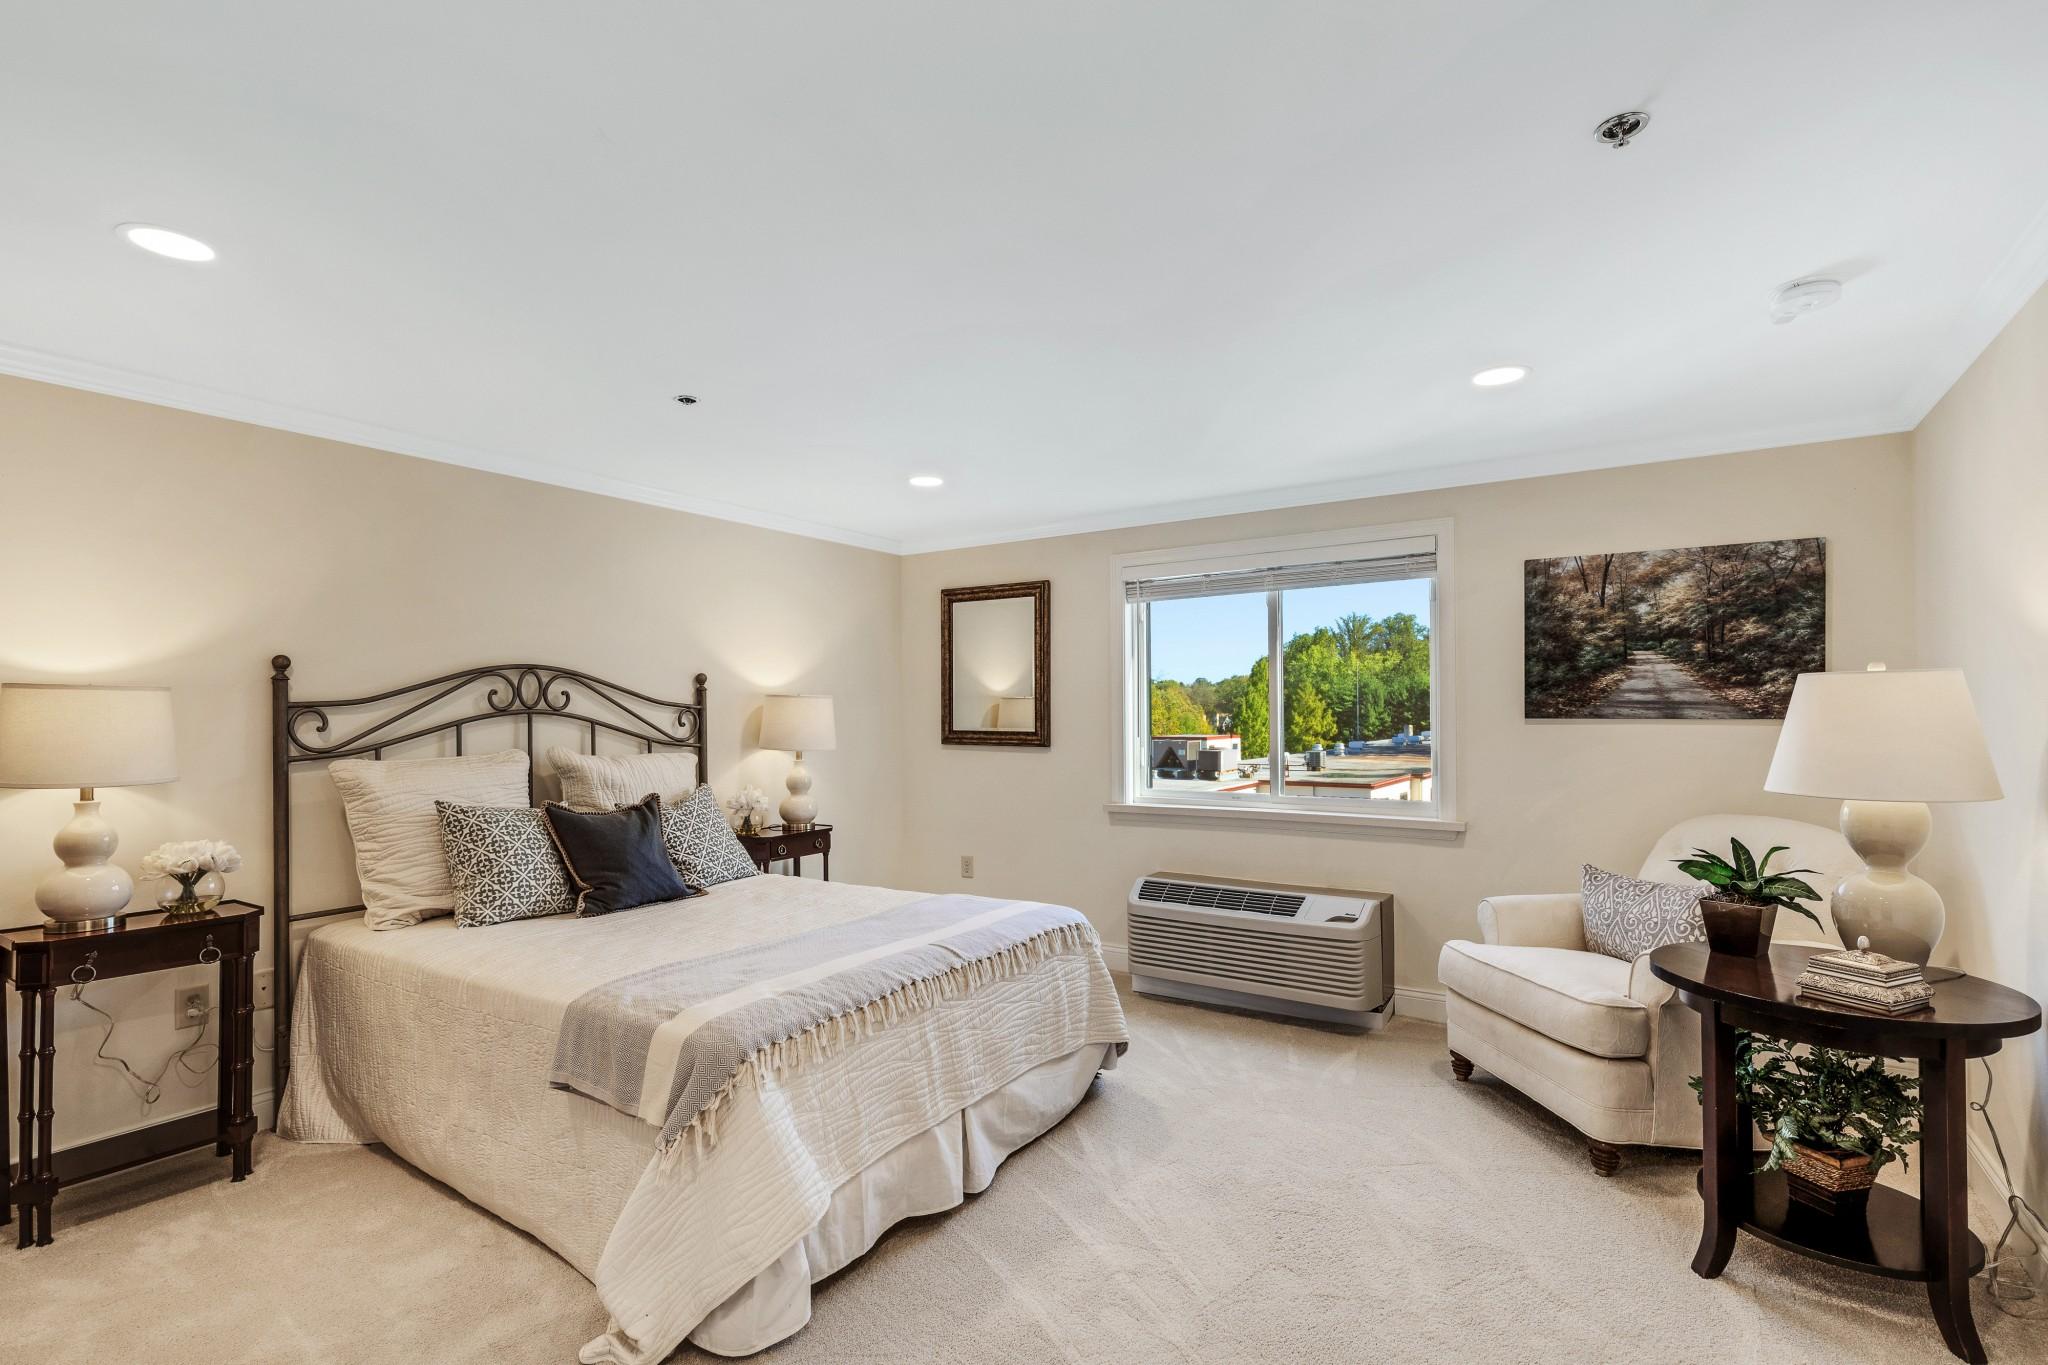 The Cheswick Series bedroom 2